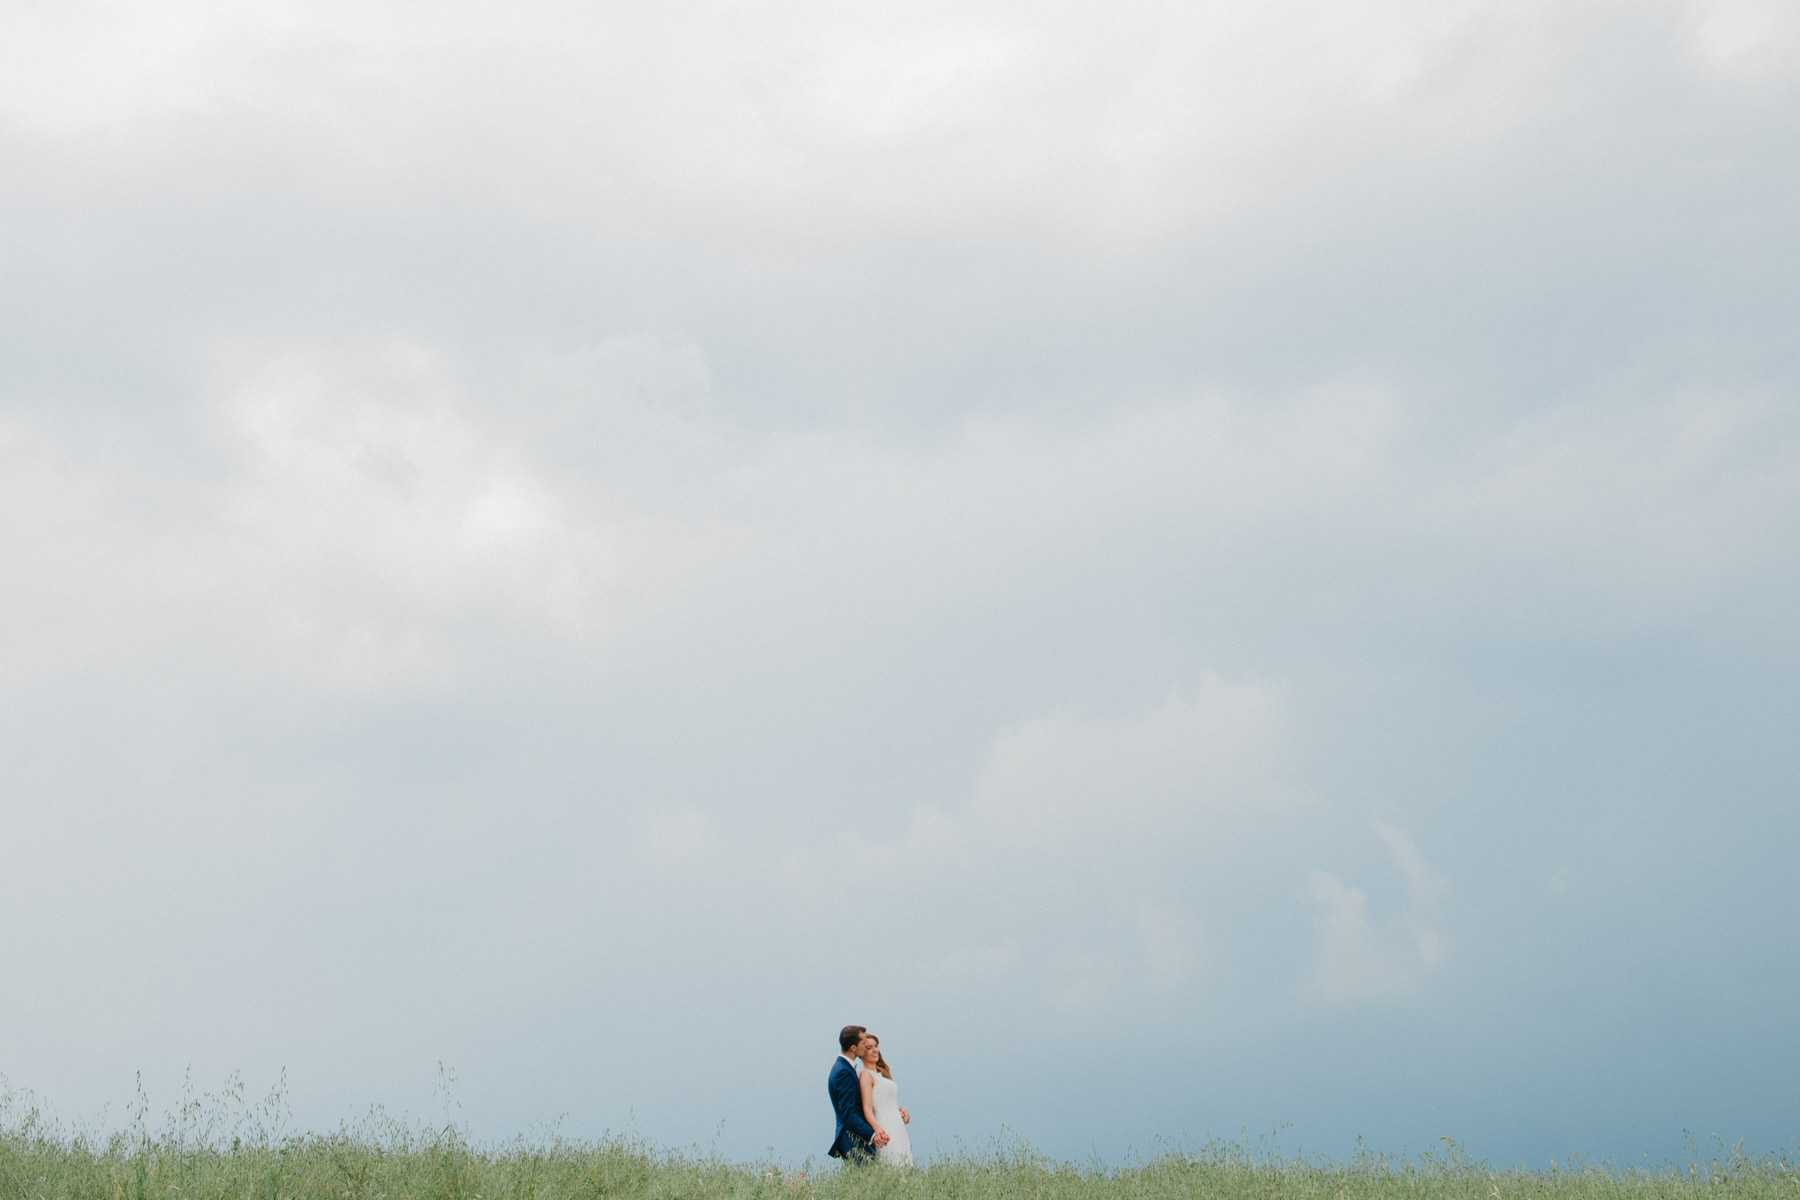 stefano torreggiani phototeam-fotografo-matrimonio- (15).jpg